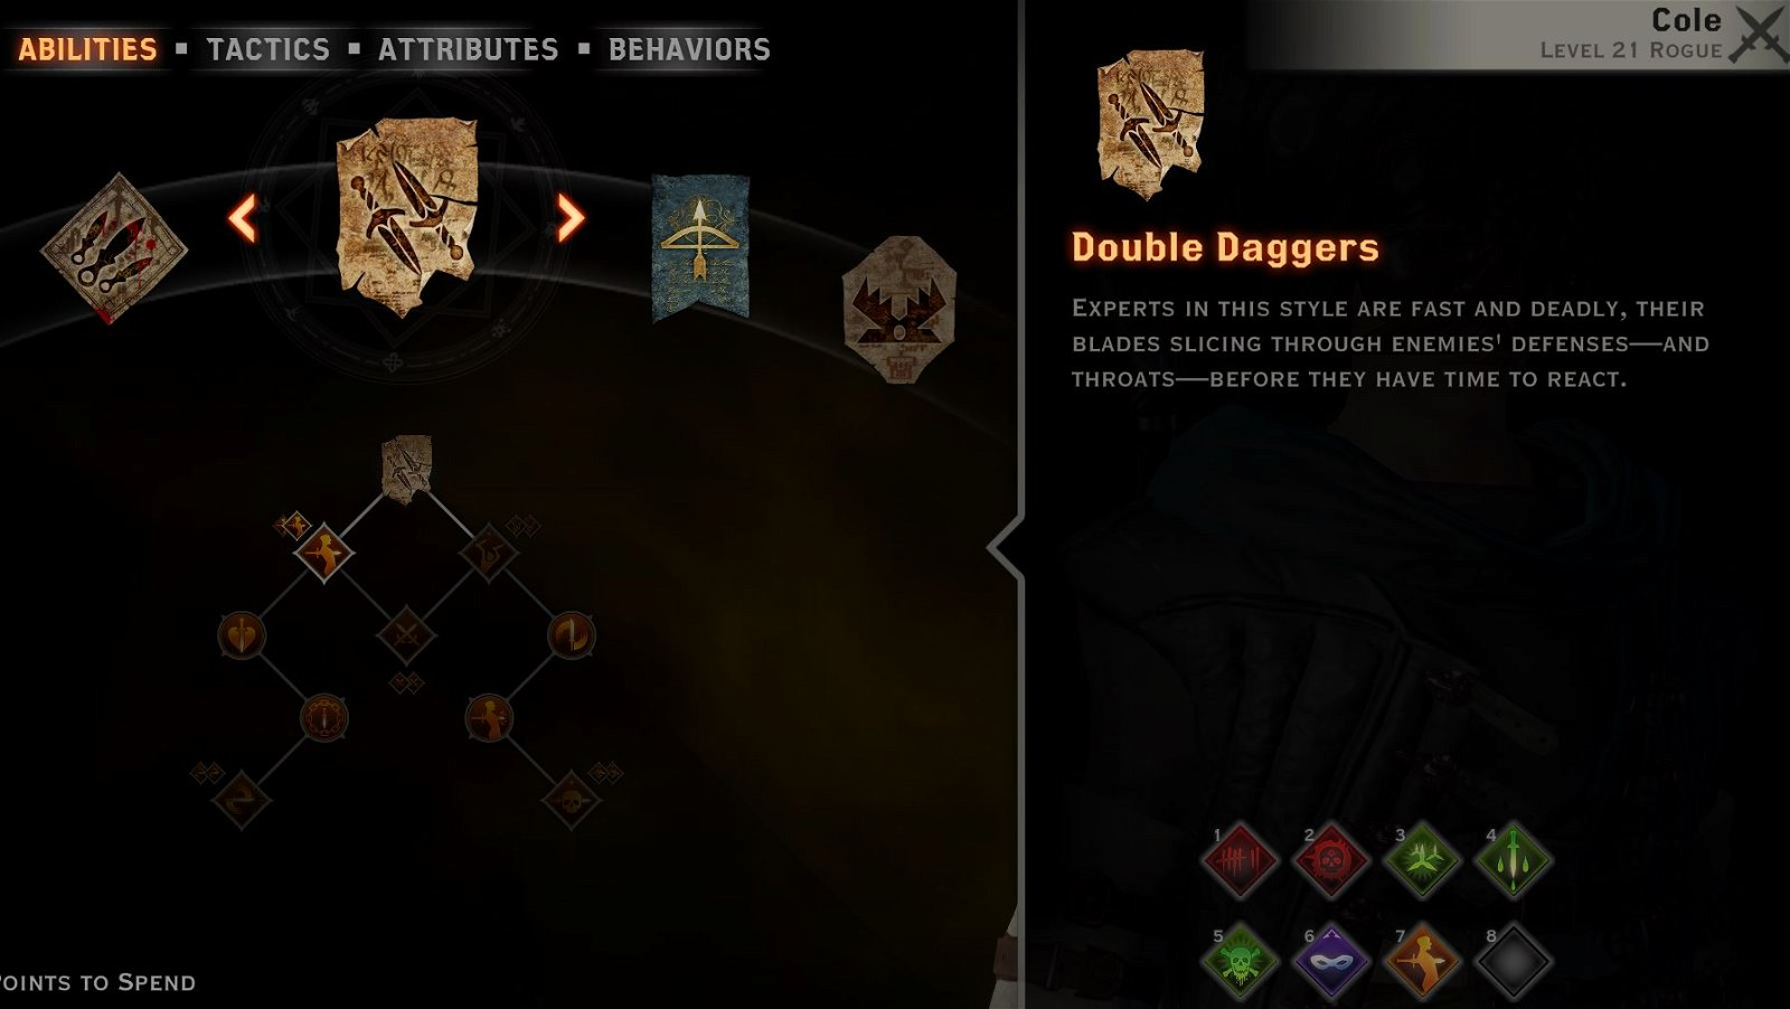 Cole dw build Double Daggers tree